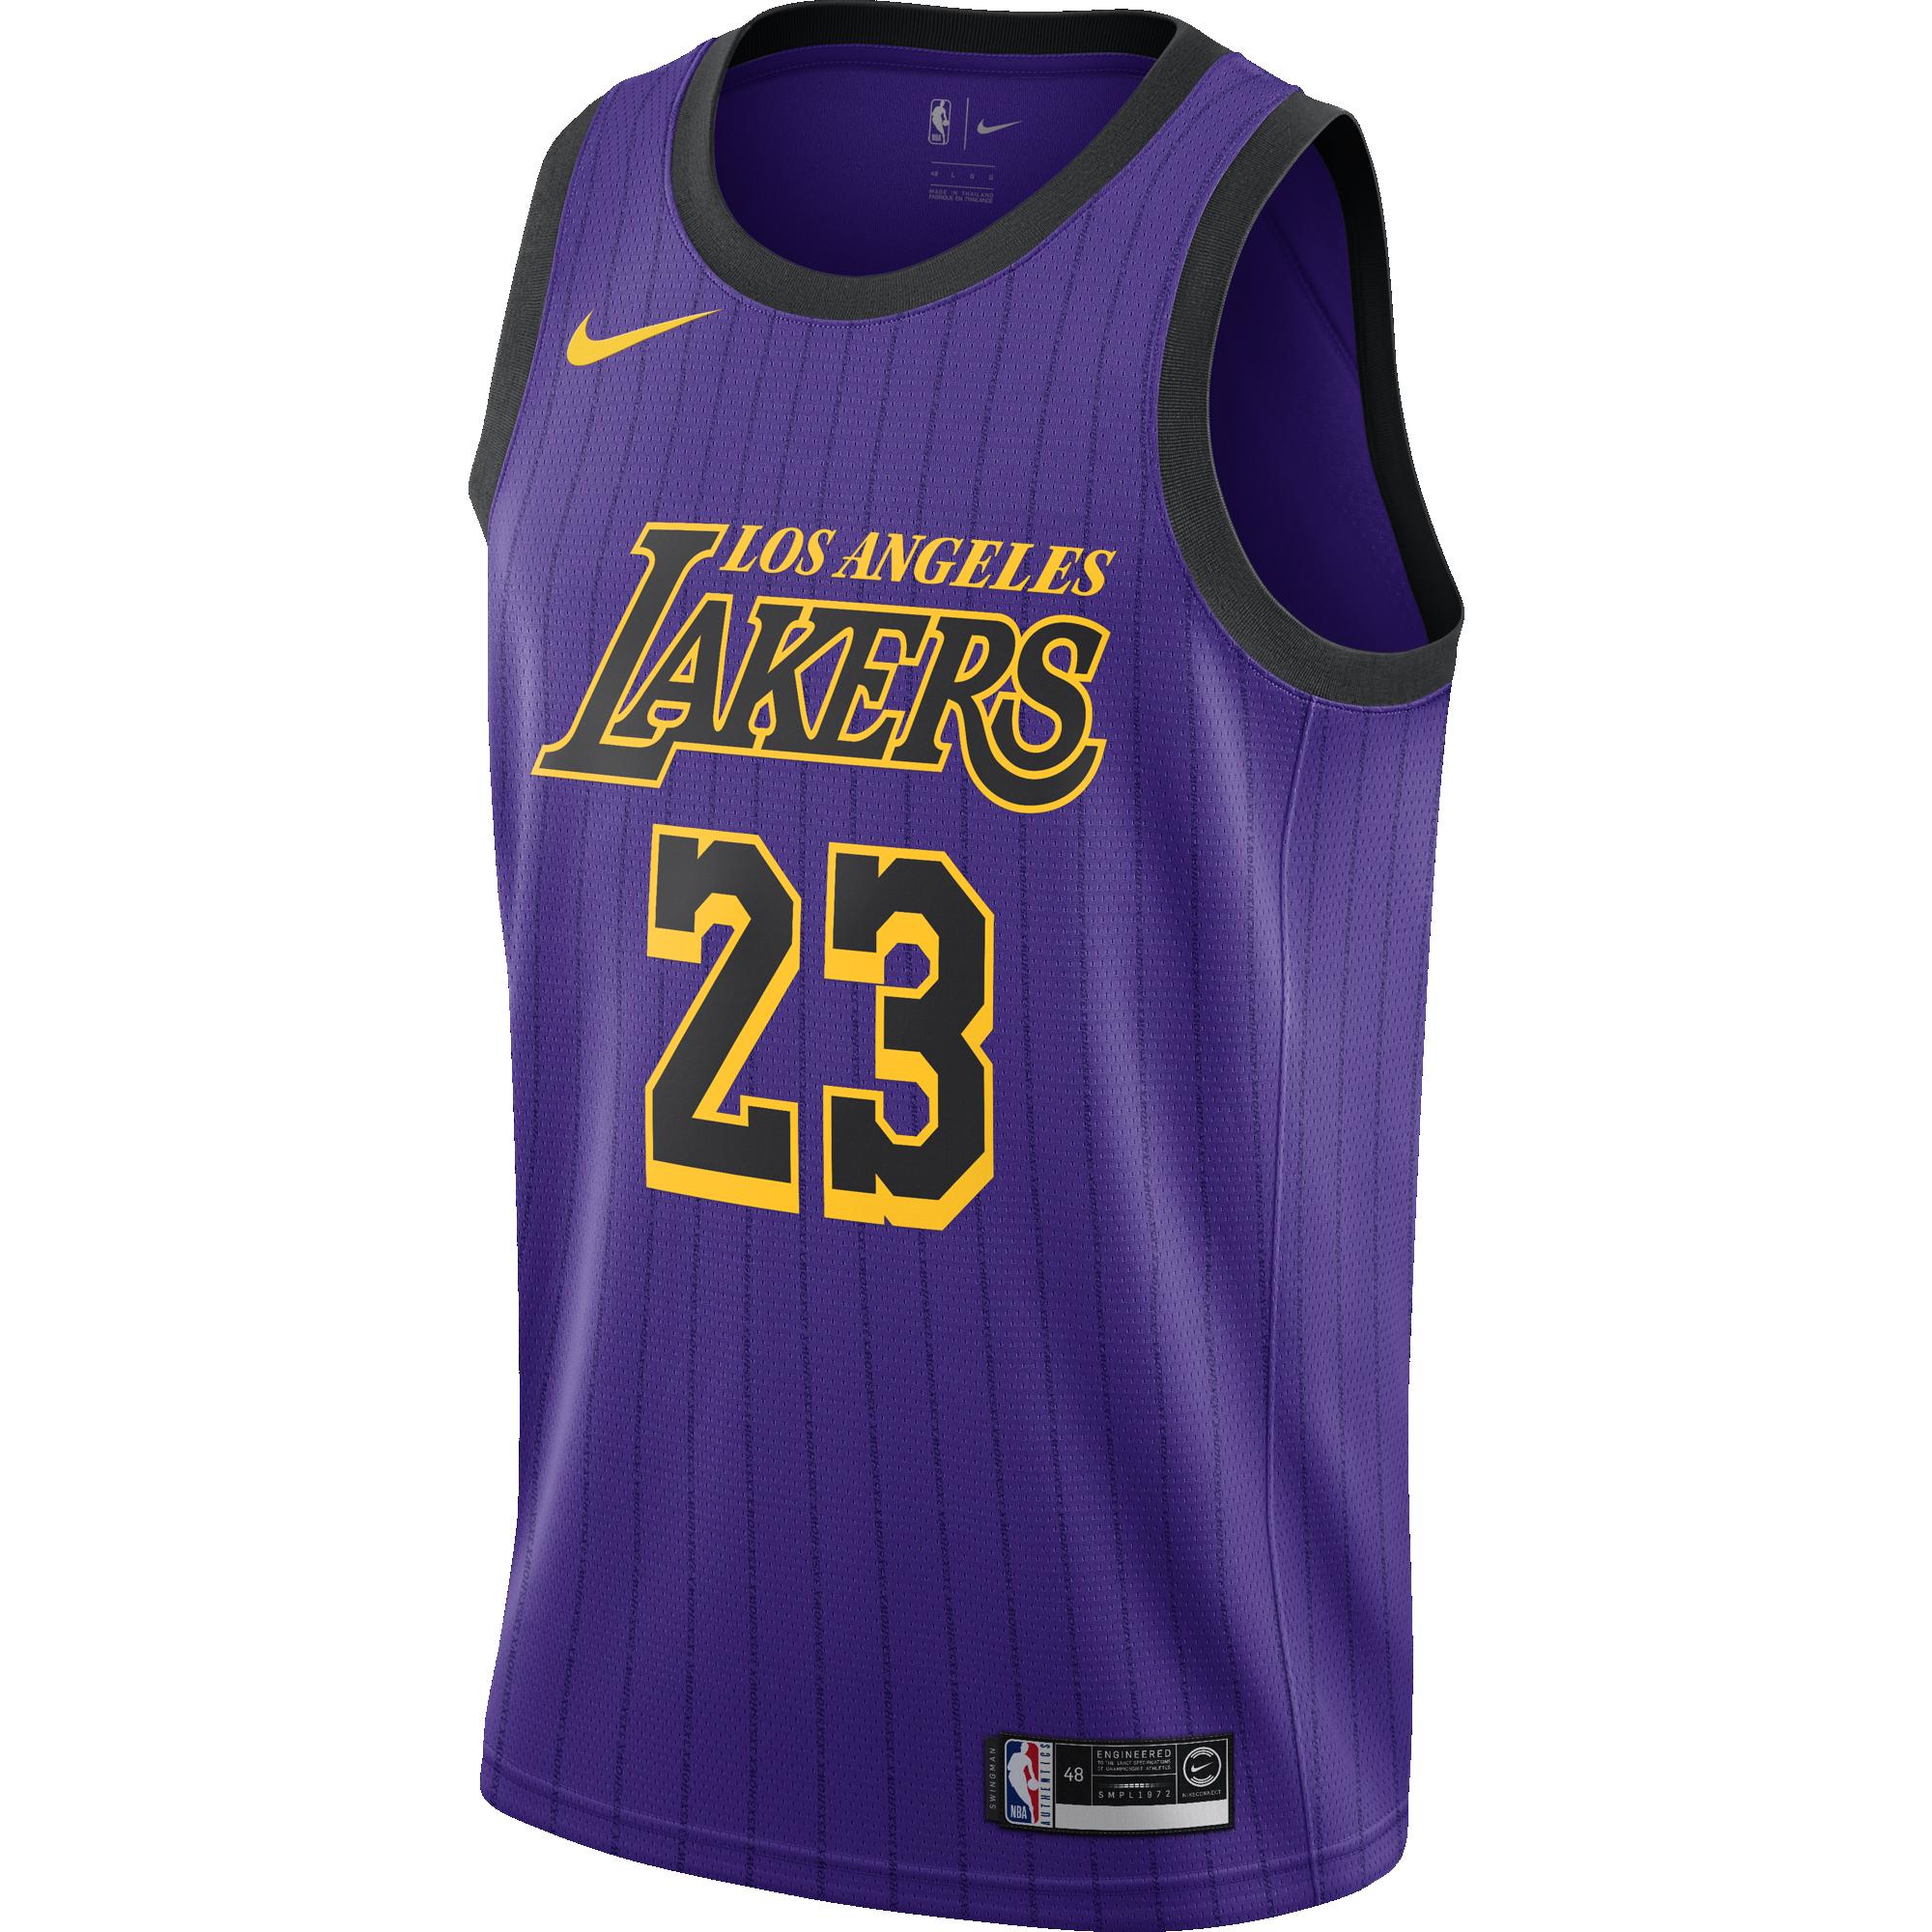 9bc4dbe55 NIKE NBA LOS ANGELES LAKERS LEBRON JAMES SWINGMAN JERSEY for £80.00 ...